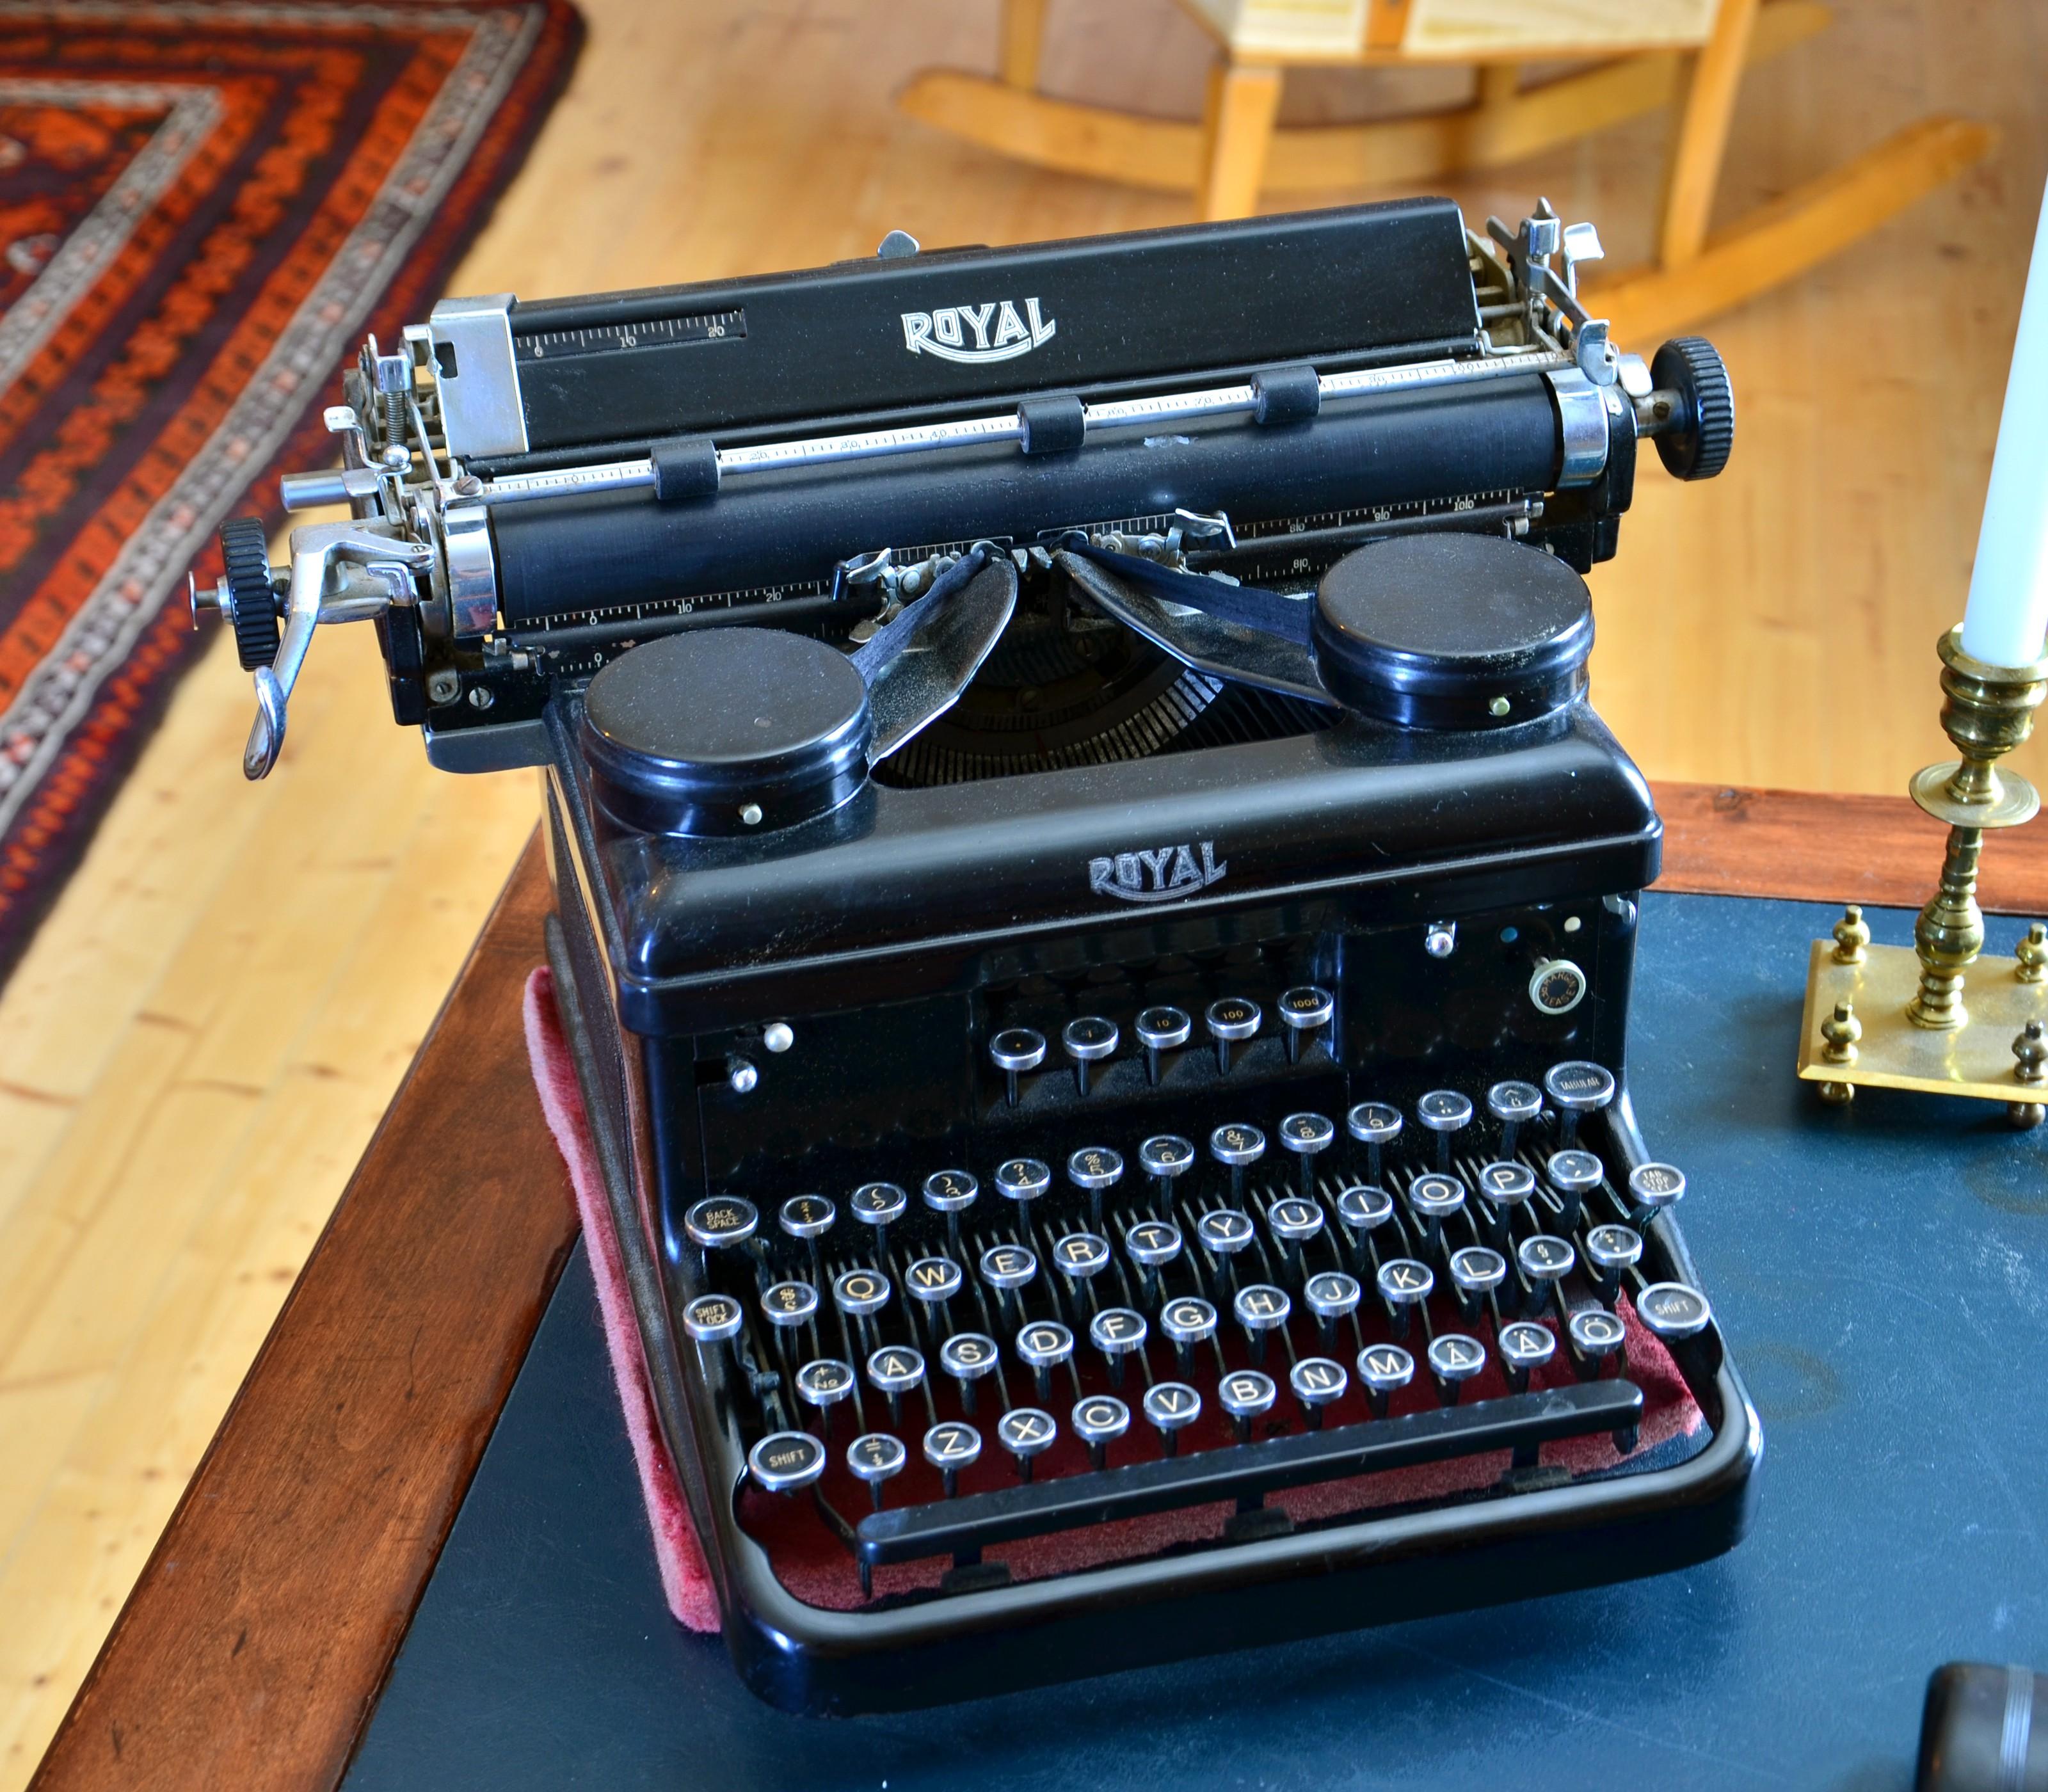 File:Royal Typewriter, Söderlångvik museum.jpg - Wikimedia